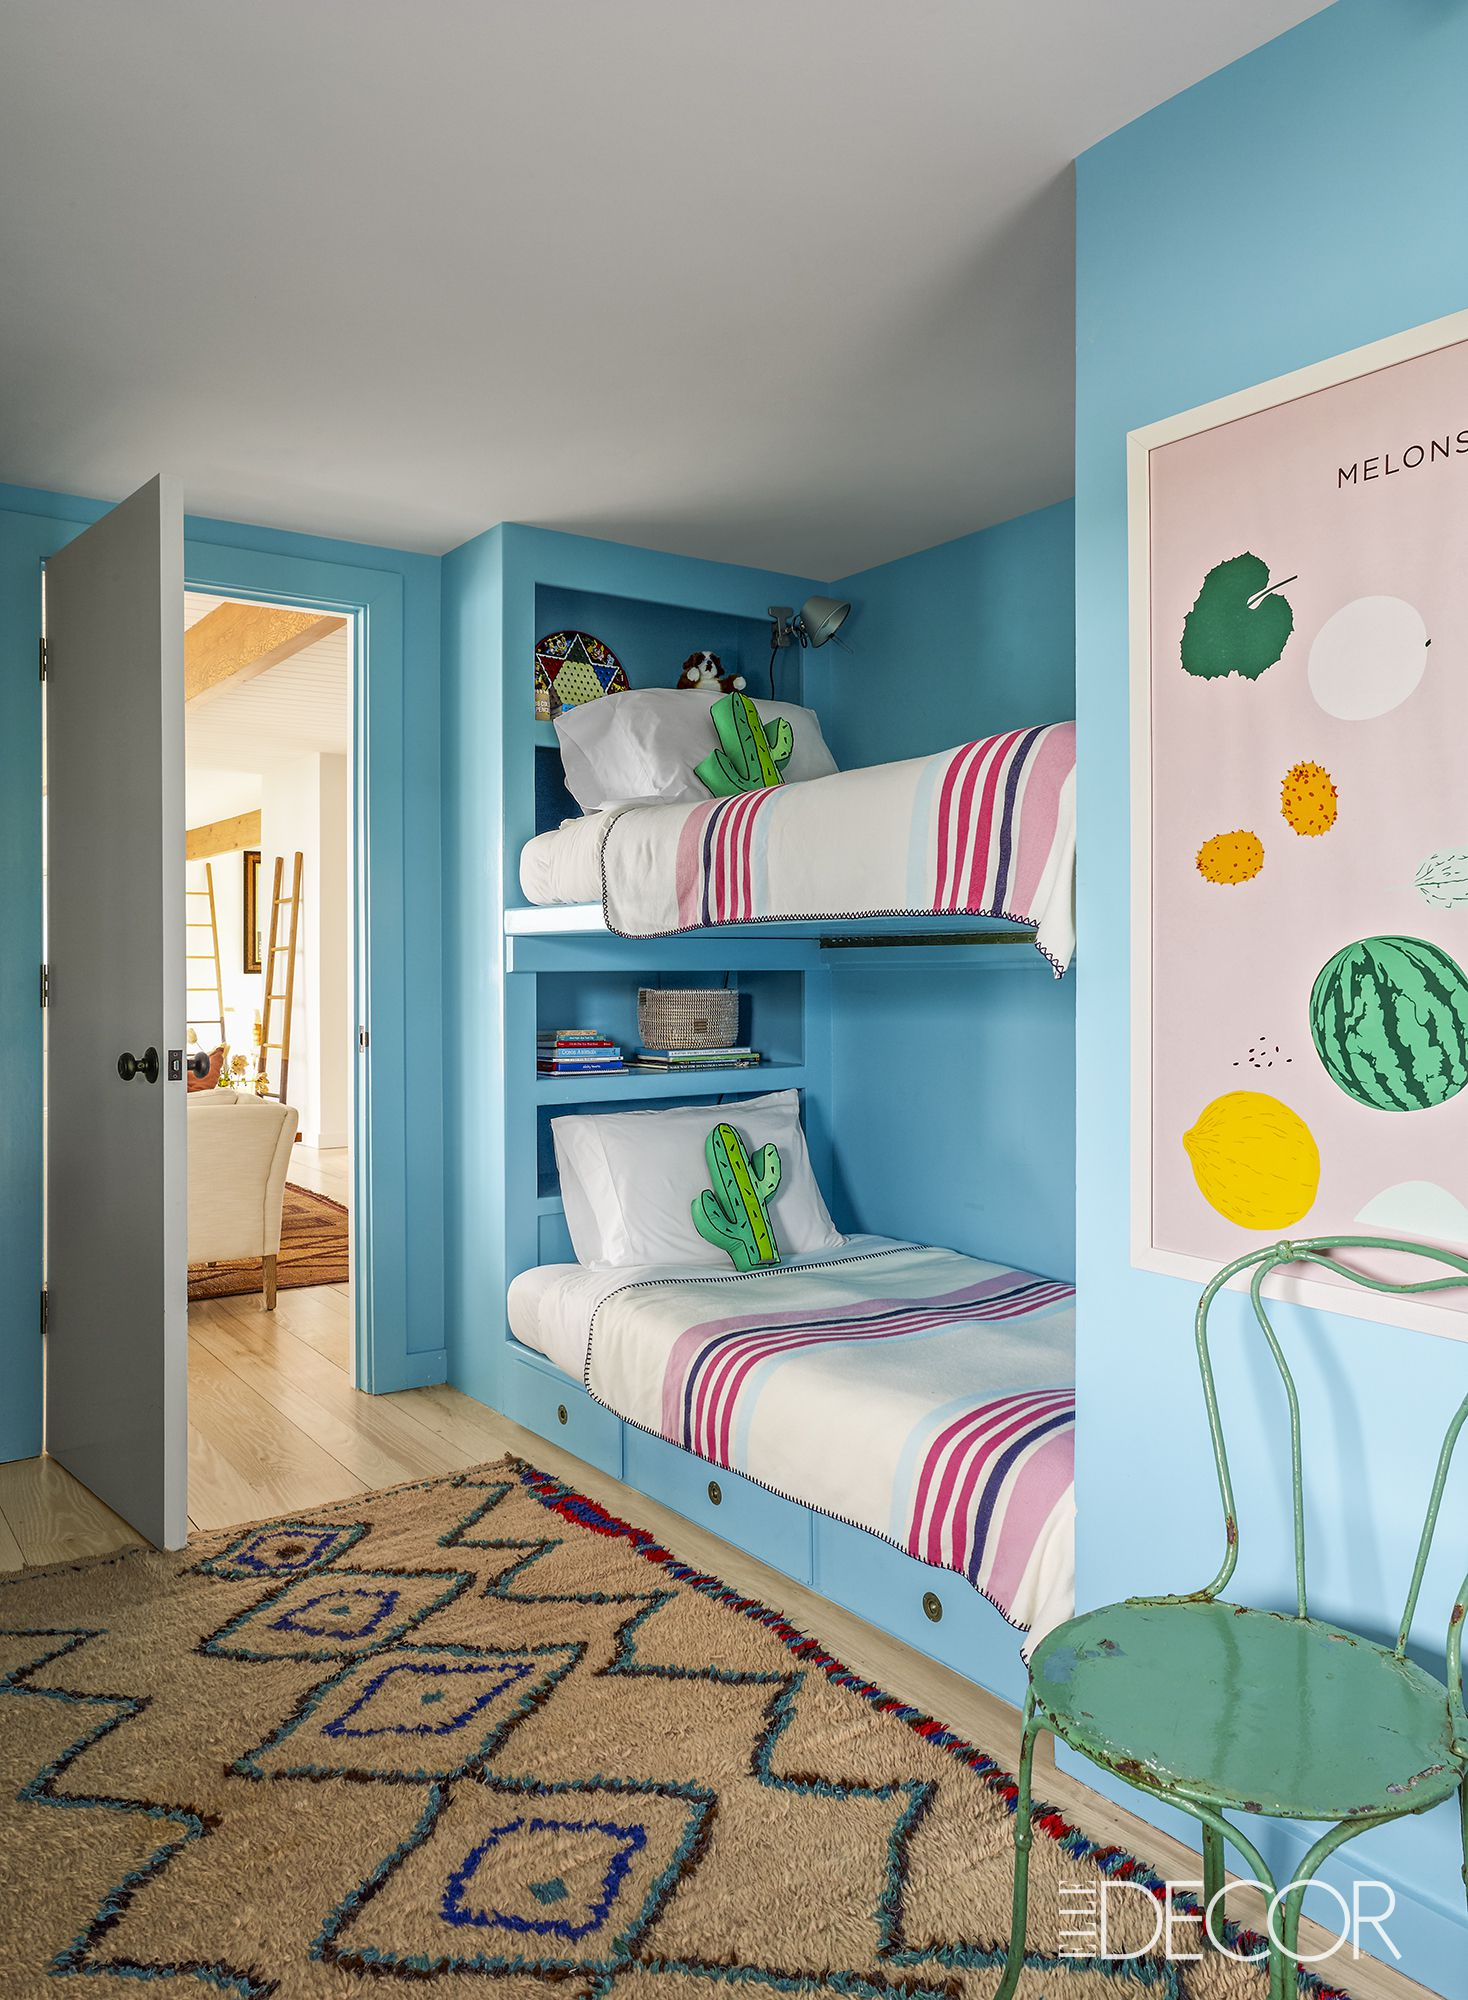 kids room design 18 cool kidsu0027 room decorating ideas - kids room decor IIHFFRC